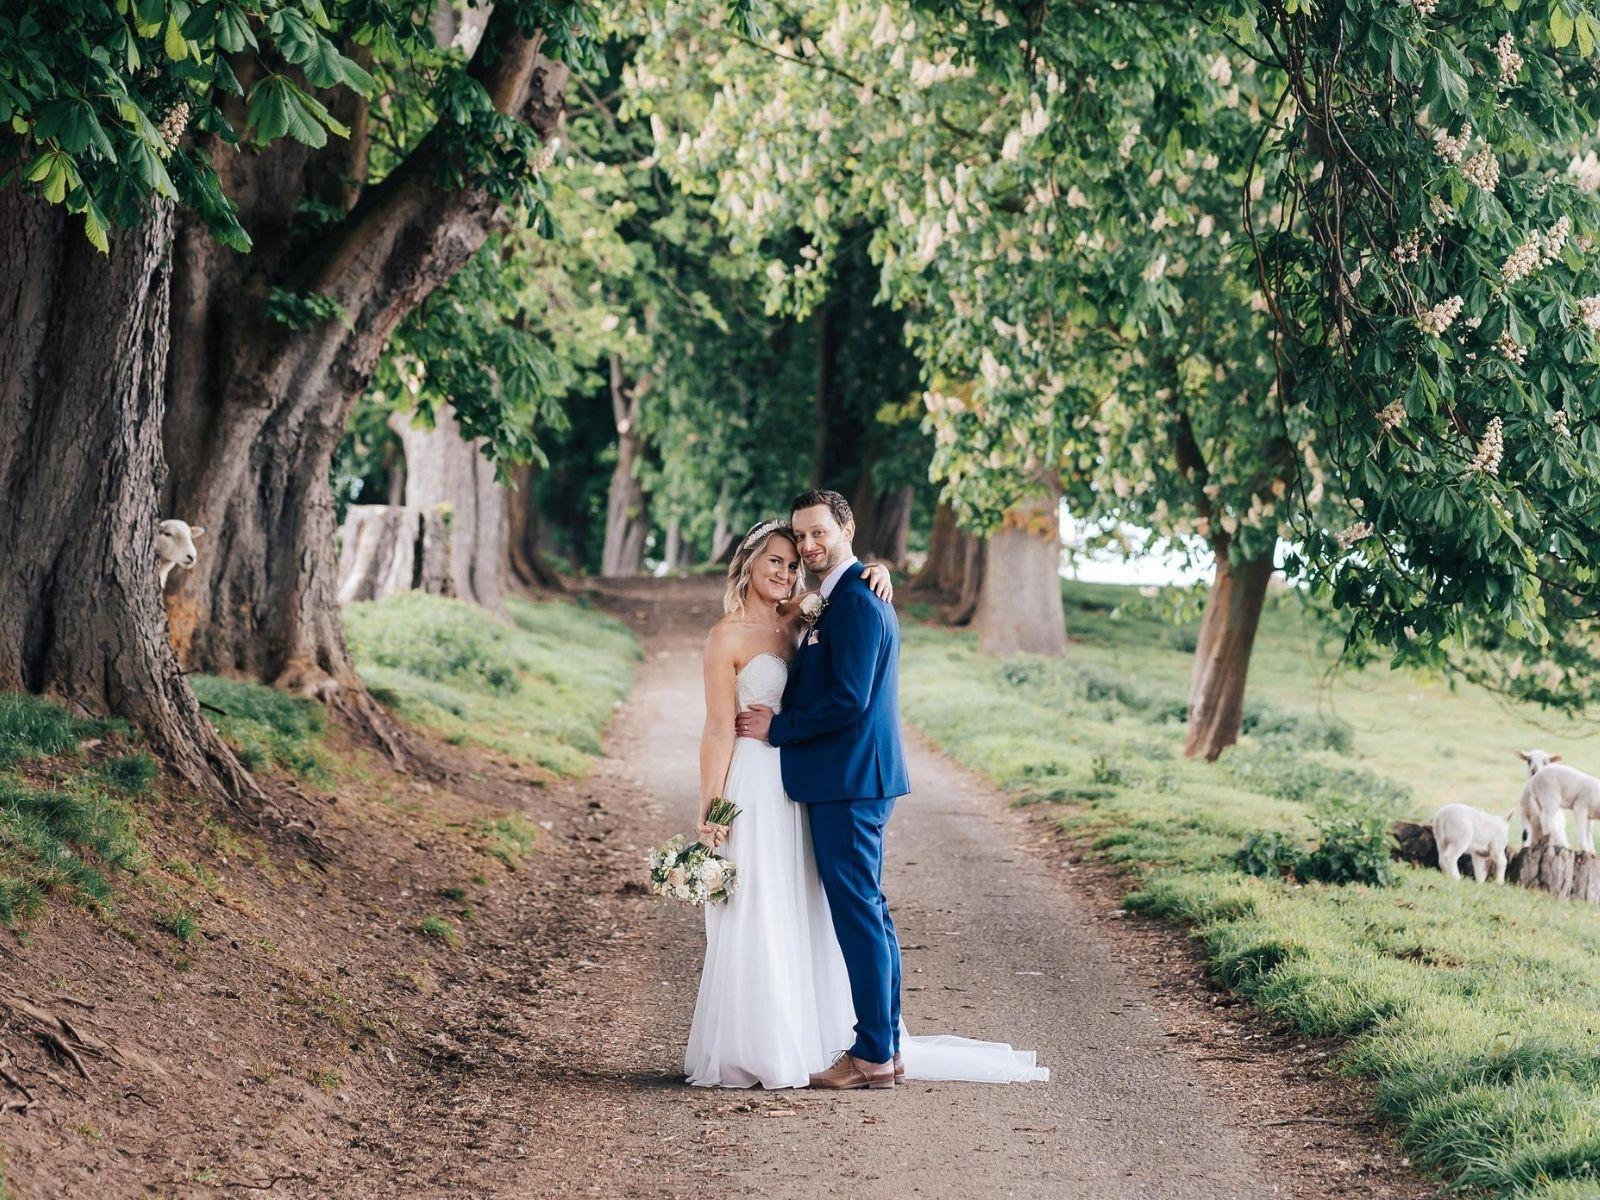 Couple wedding photography bride wearing Millie May wedding dress stratford wedding dress shop